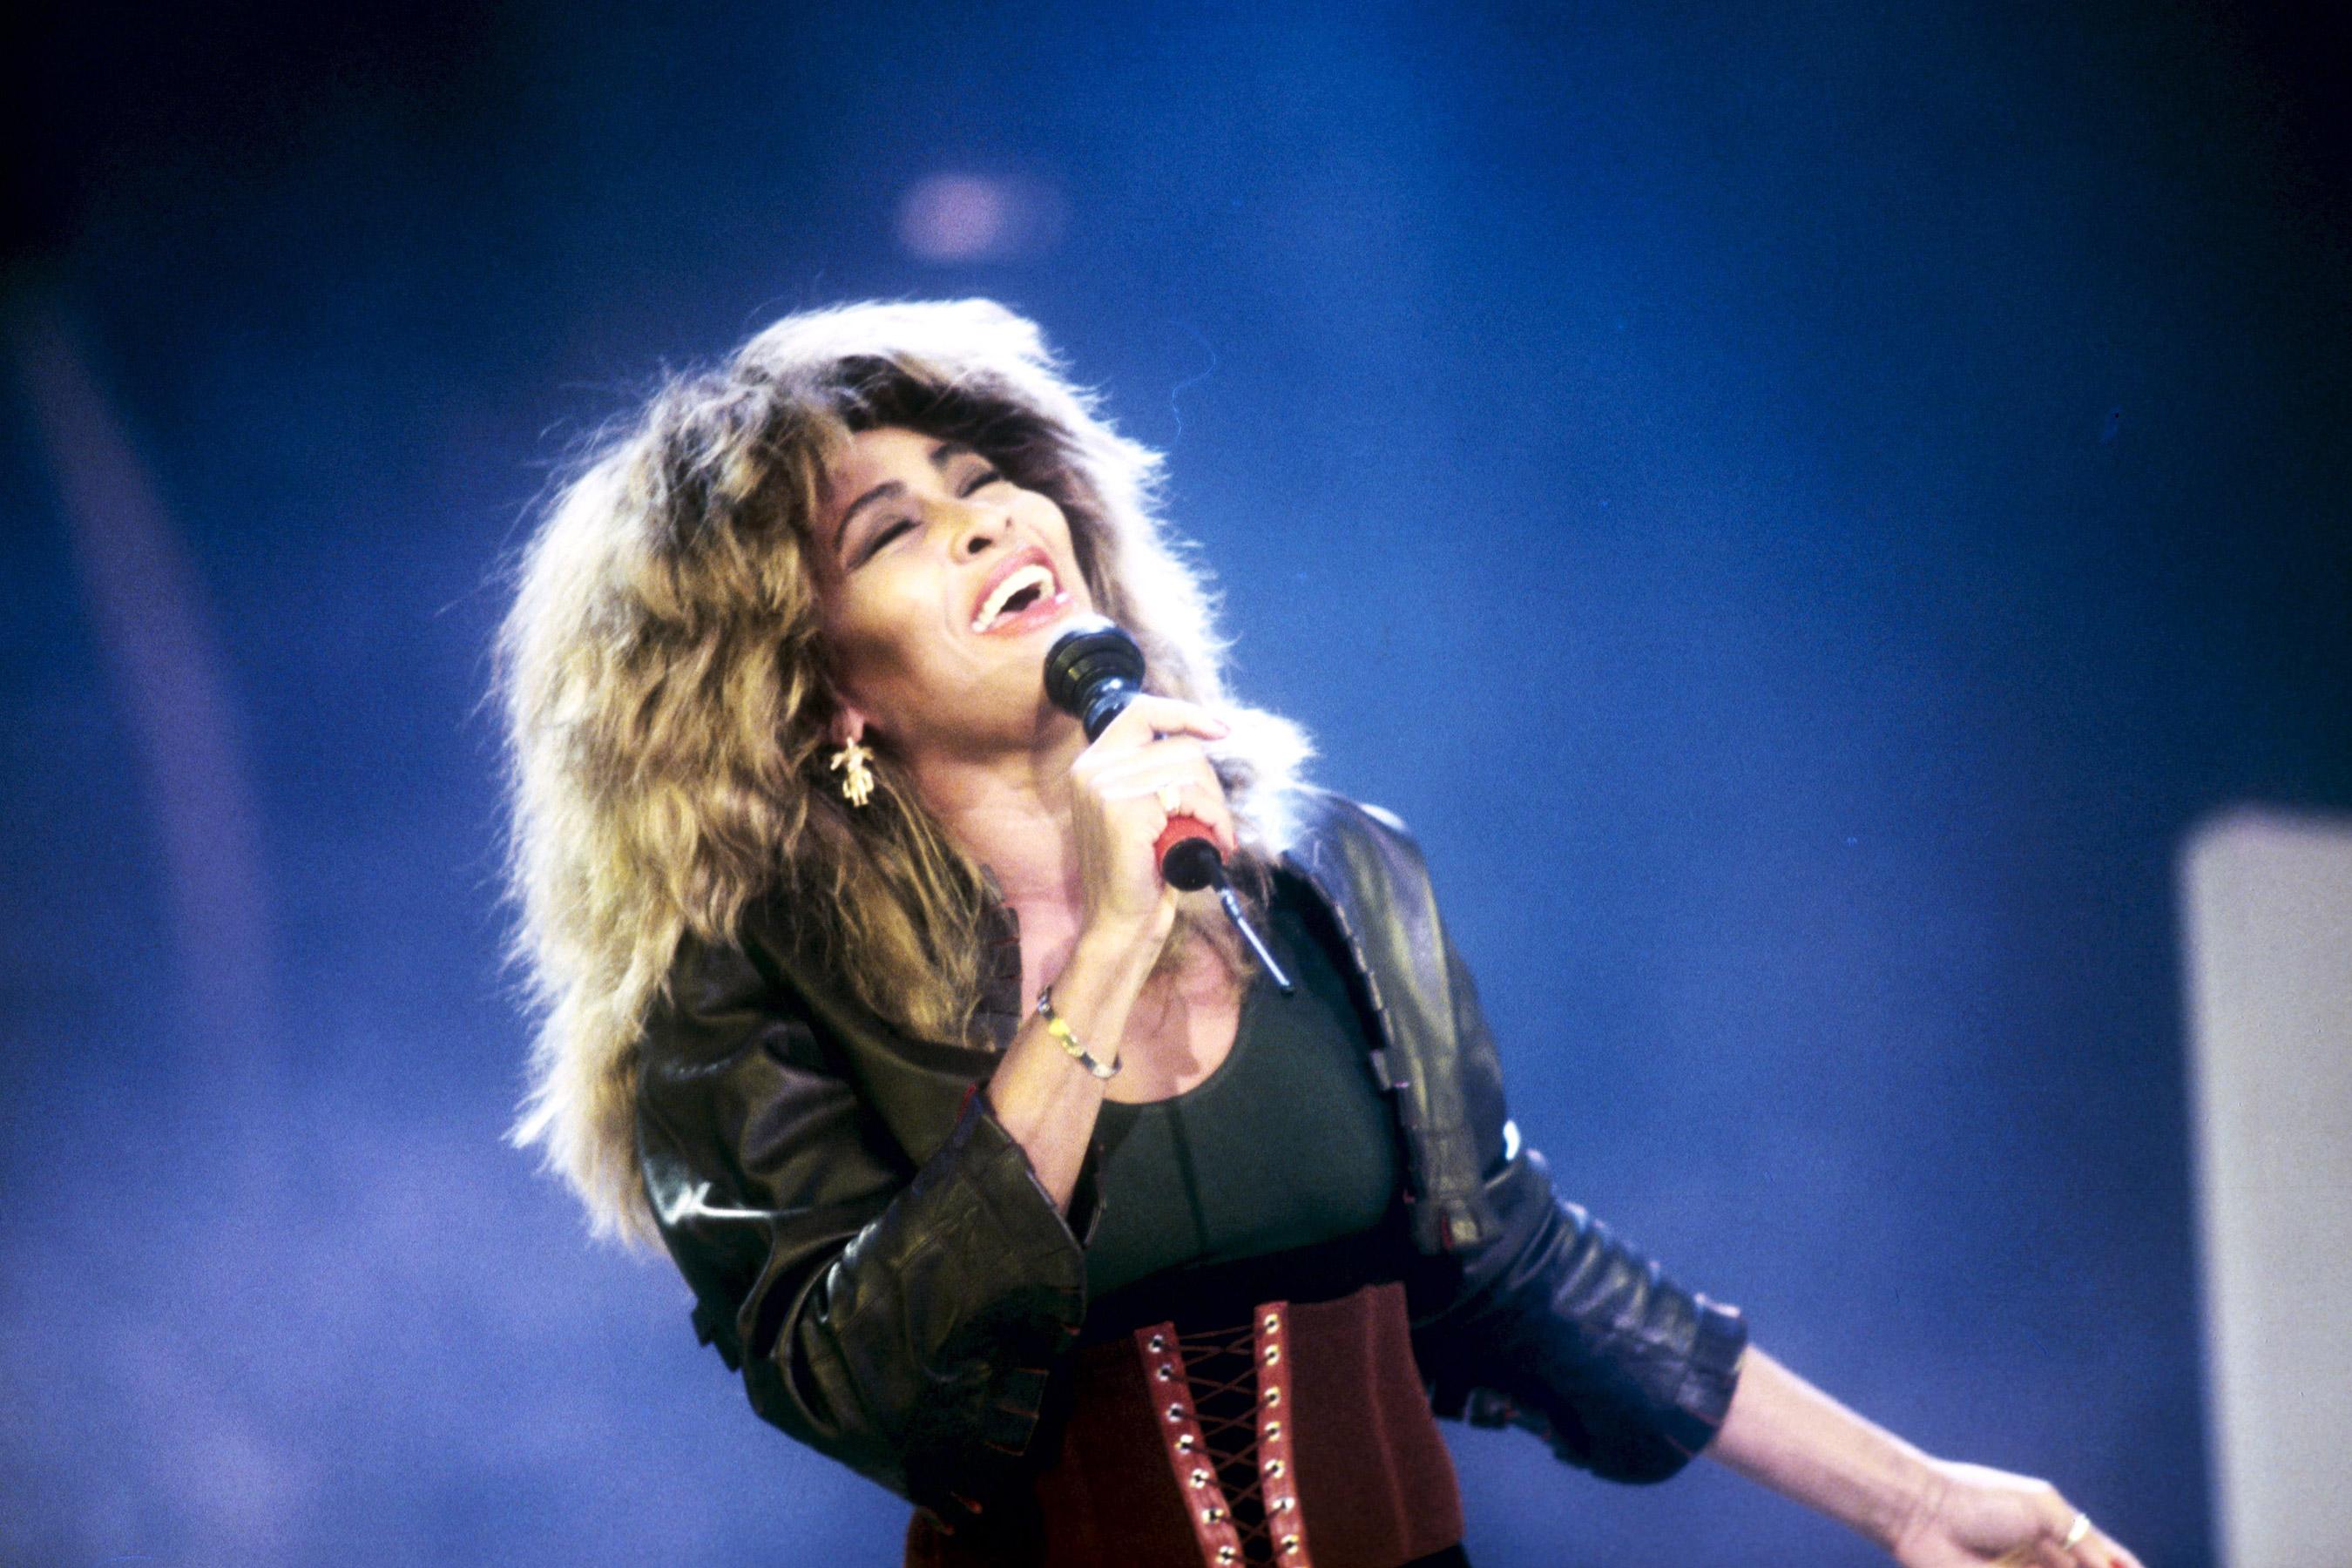 cb447342a5 Tina Turner Musical  Tina  Set for Broadway Debut in Fall 2019 ...